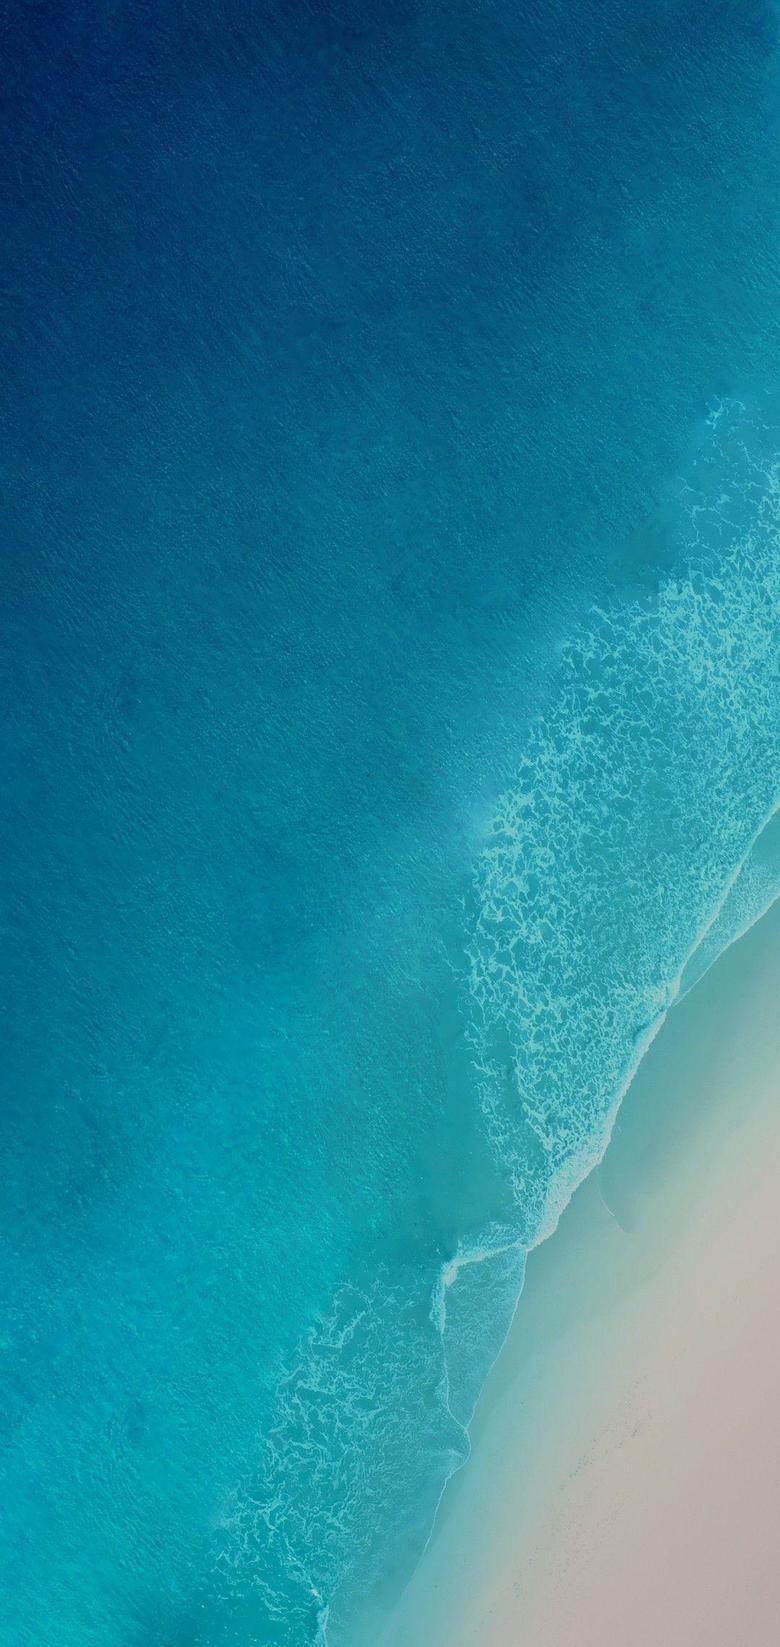 iOS 12 iPhone X Aqua blue Water ocean apple wallpaper iphone